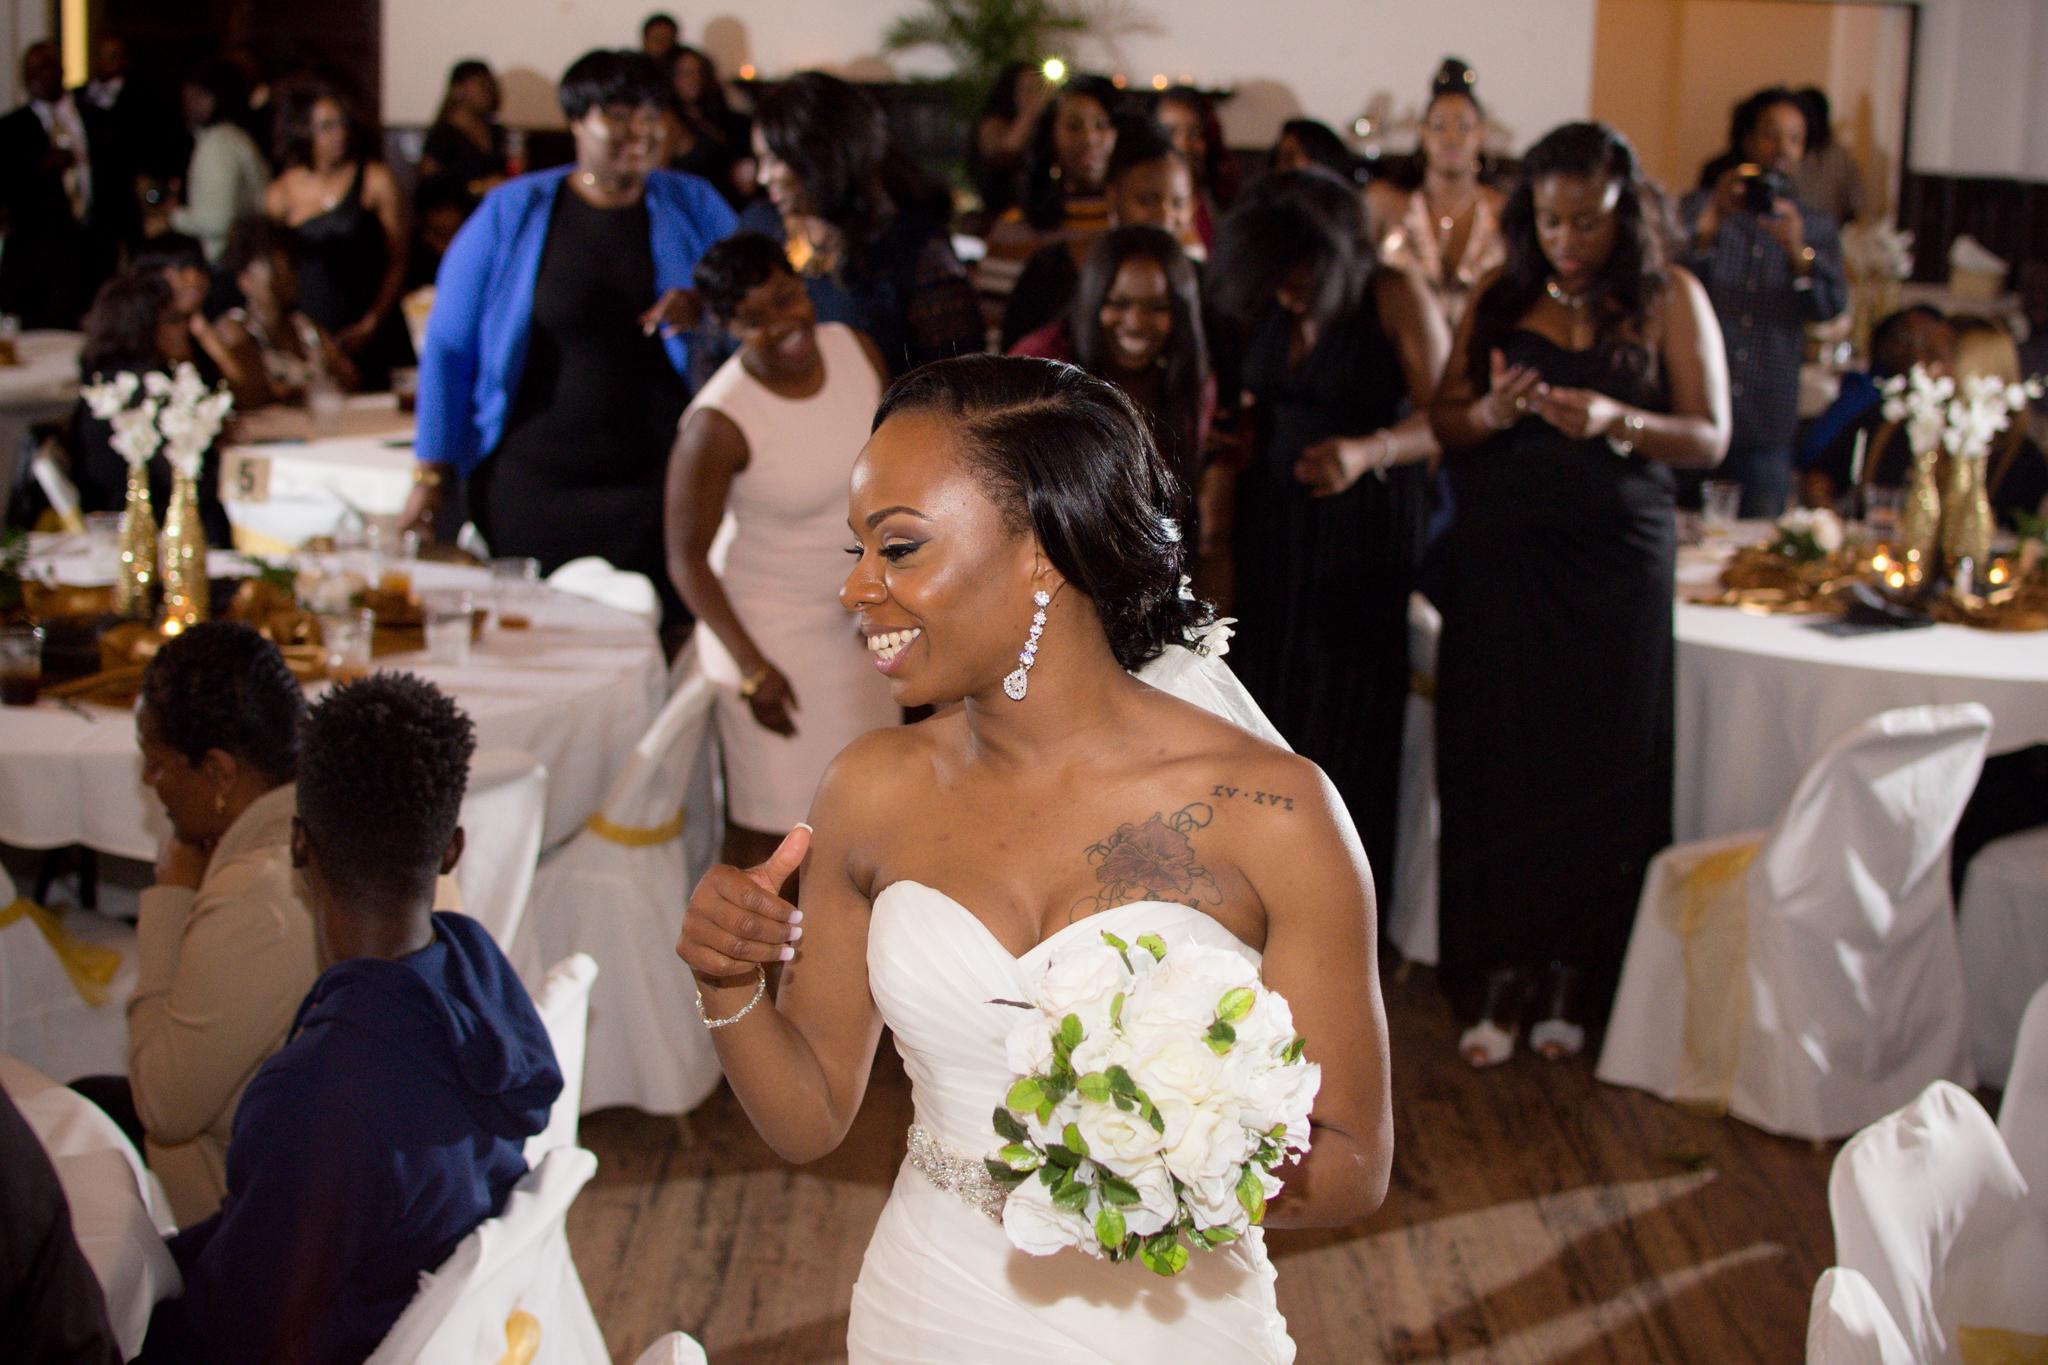 chaplin wedding (173 of 181).JPG